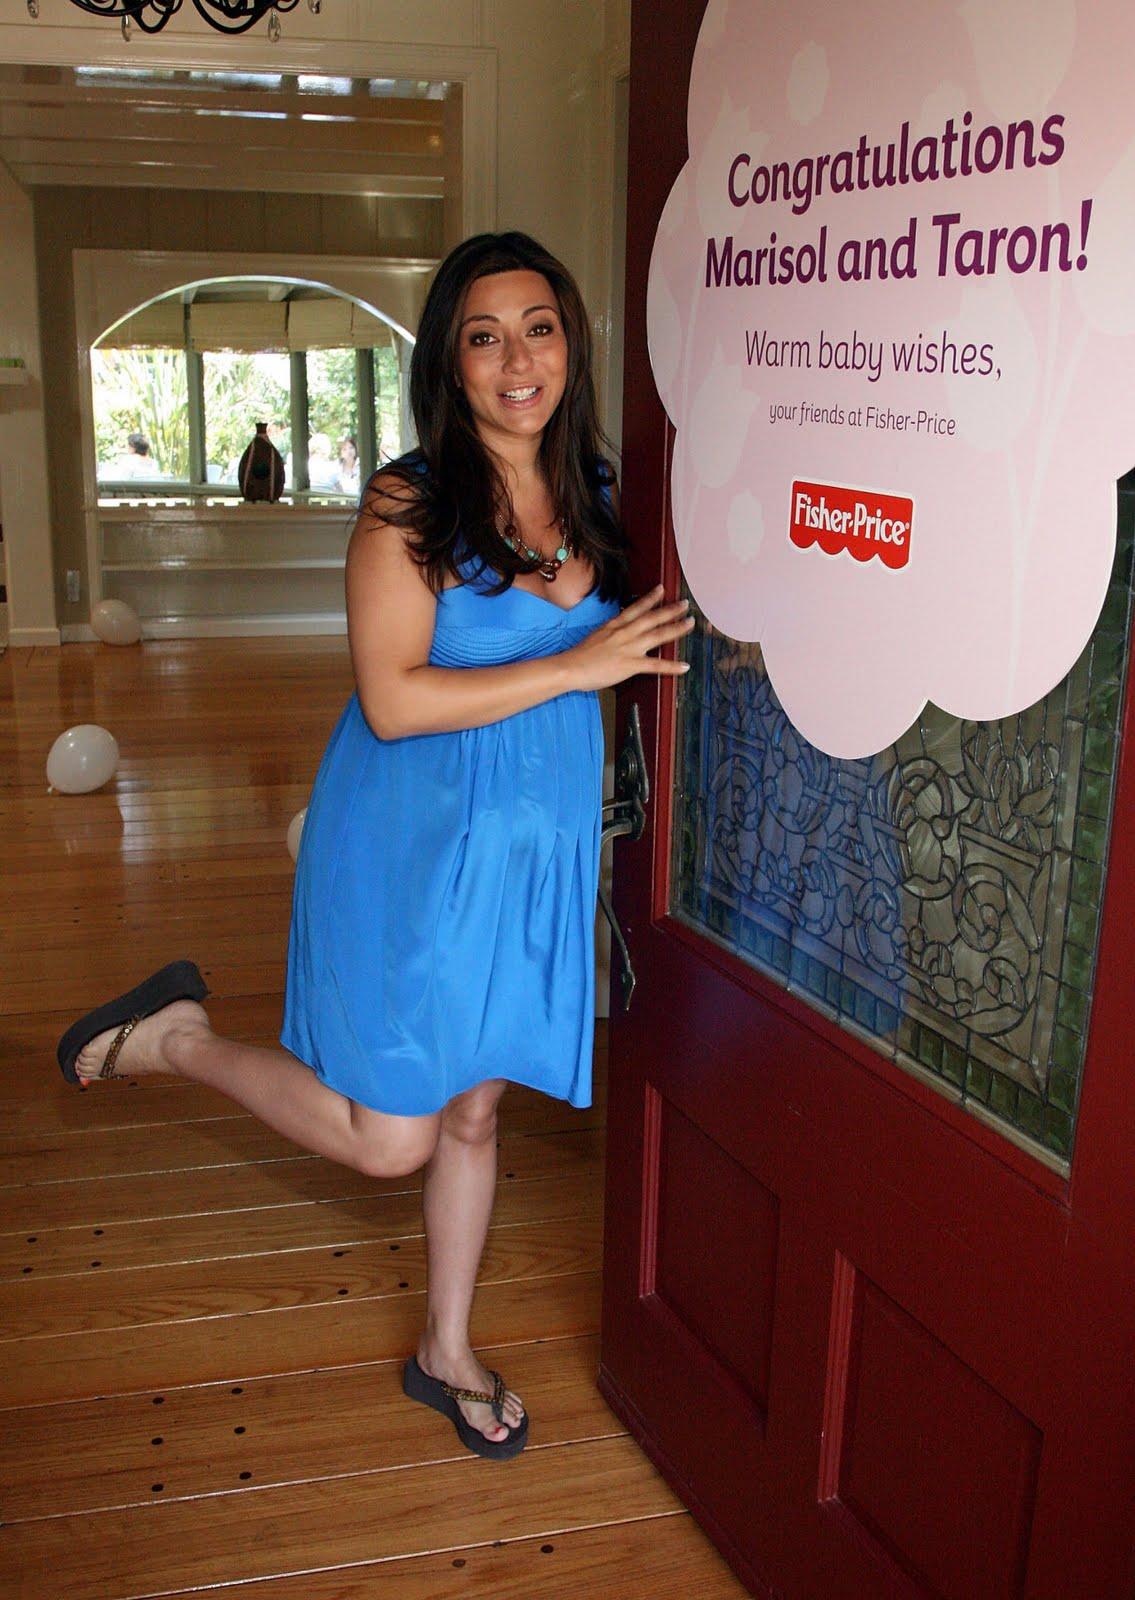 http://1.bp.blogspot.com/_UaLWp72nij4/TAVxgD9x-5I/AAAAAAAANQA/ROSrebhlxfg/s1600/marisol-nichols-feet.jpg